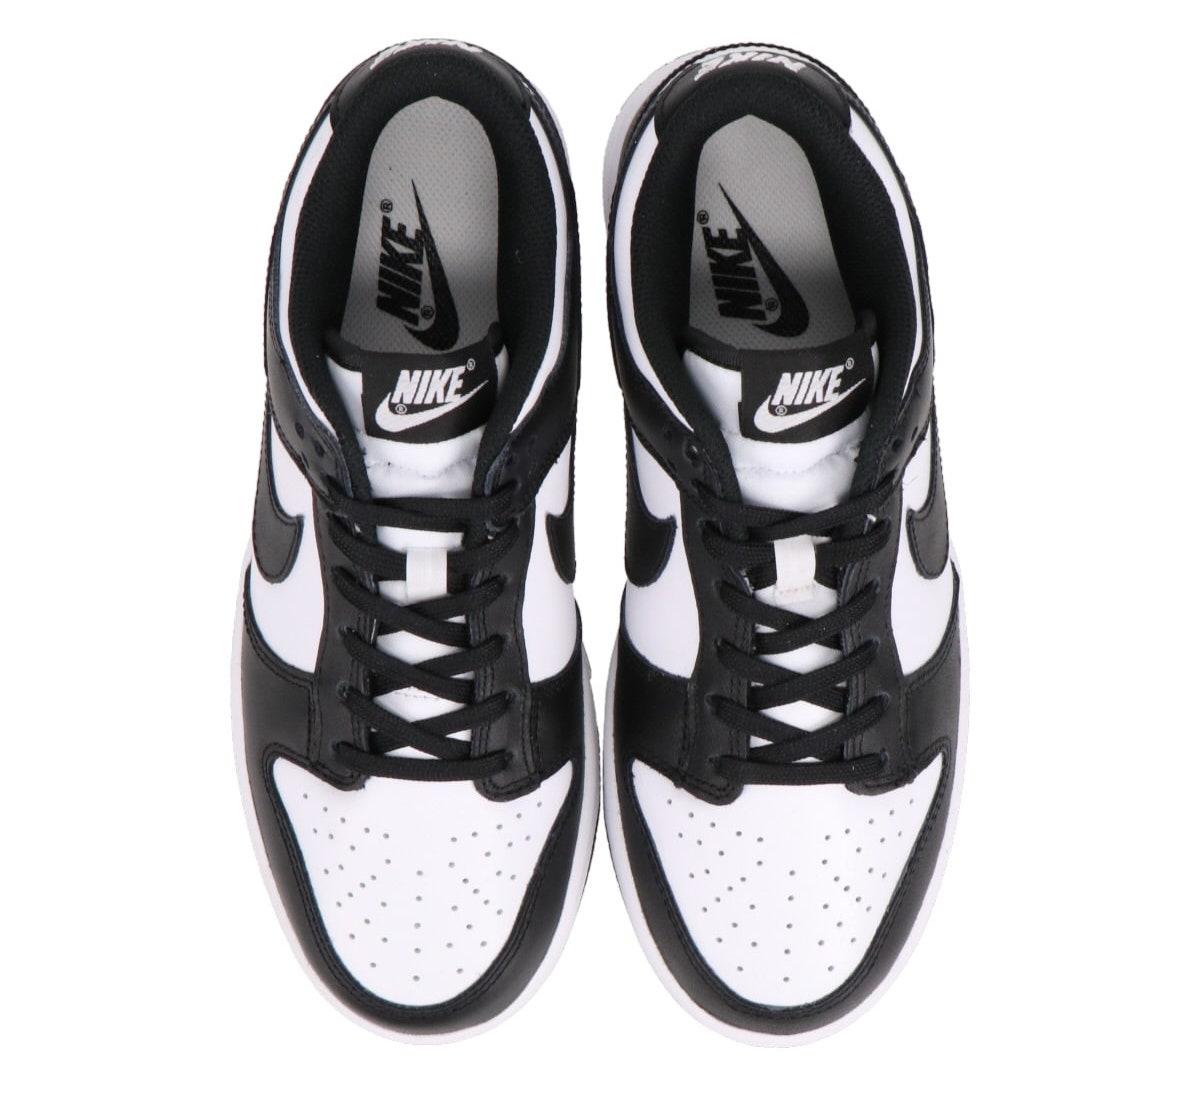 Nike Dunk Low White Black DD1503-101 Release Date